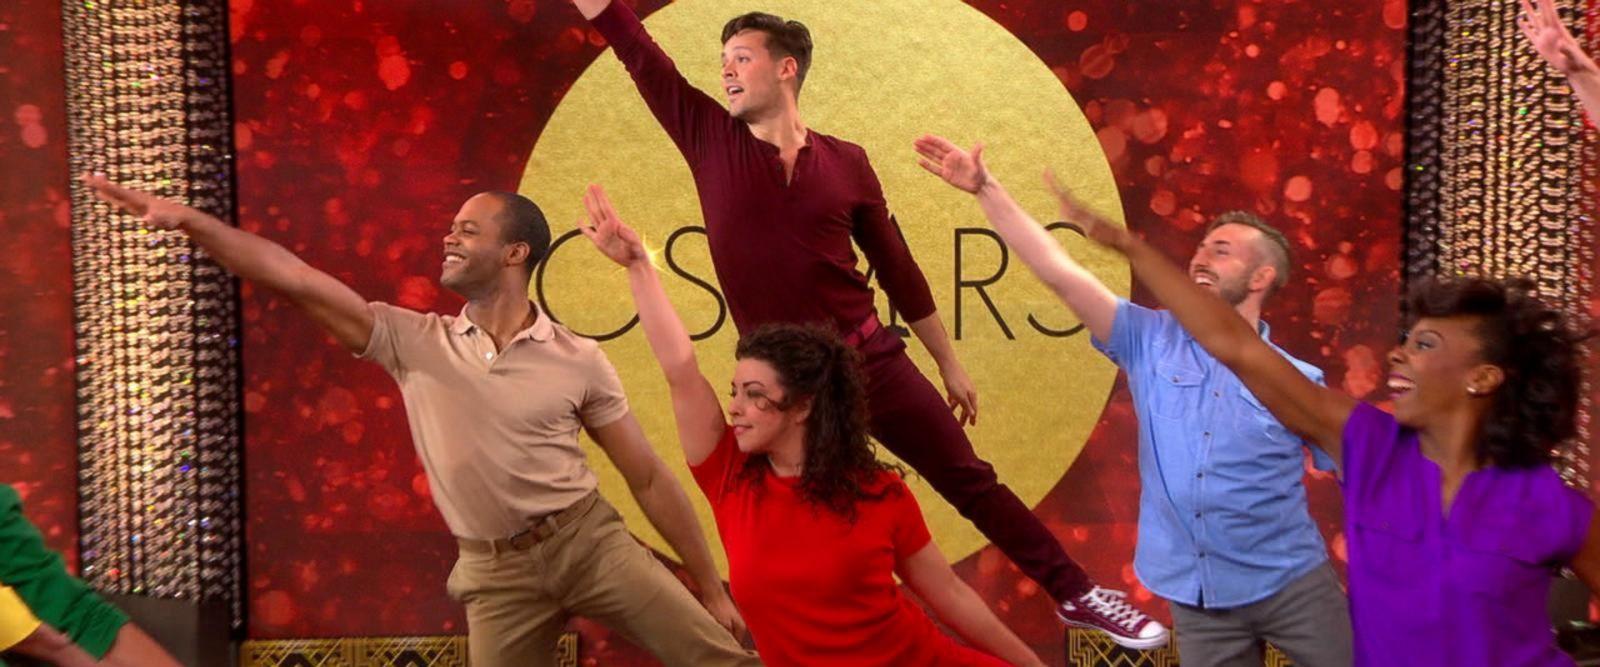 VIDEO: Dancers perform the 'La La Land' opening live on 'GMA'